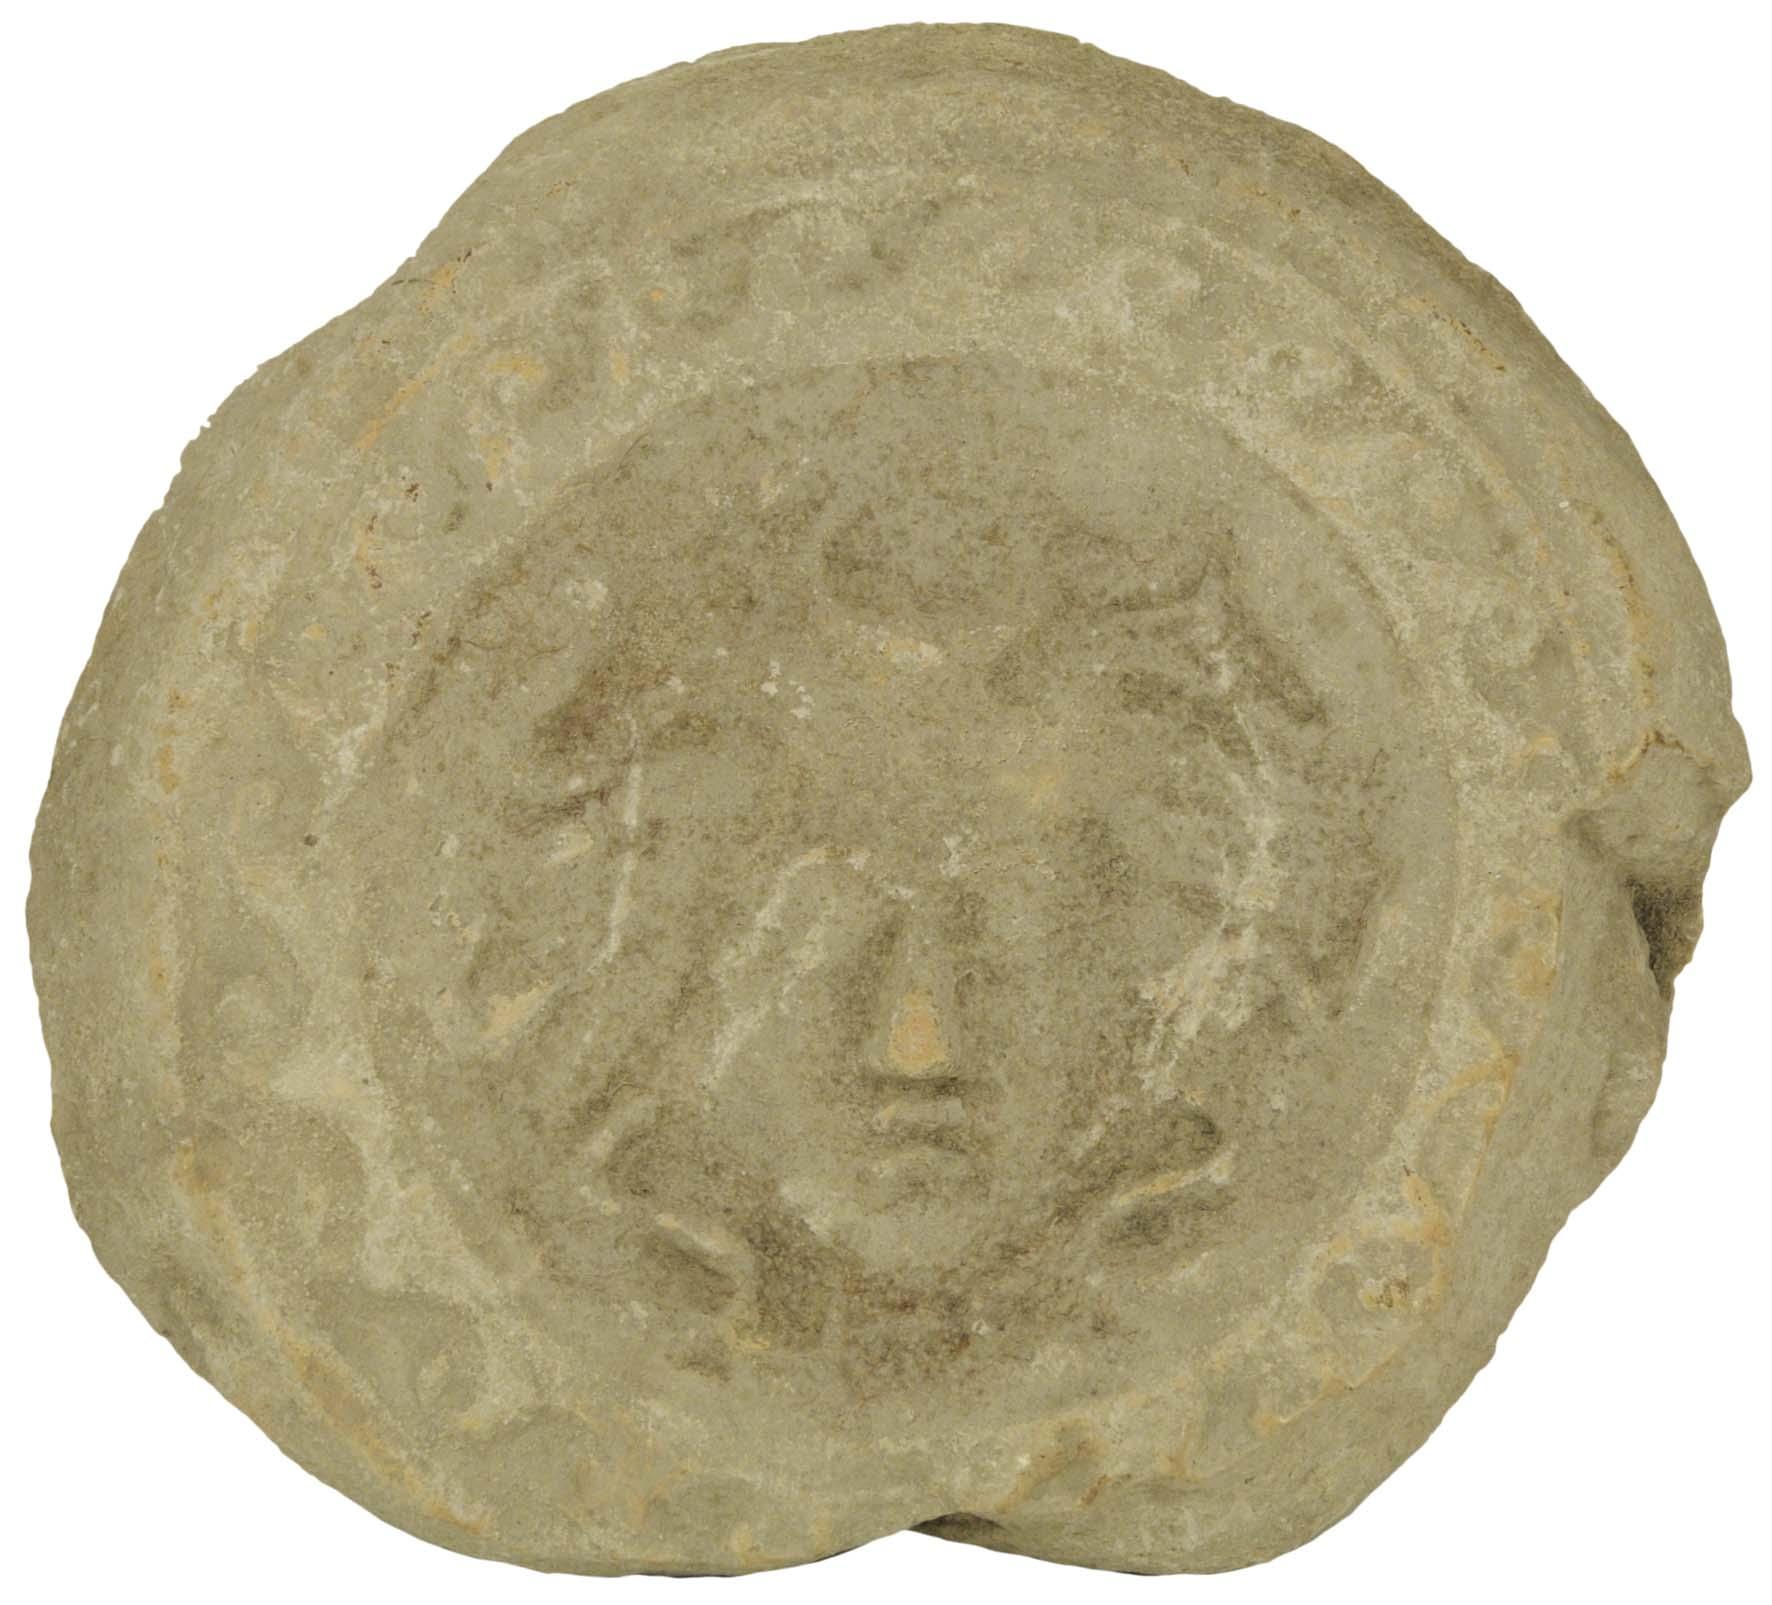 Lot 392 - Antike Antike Objekte -  Auktionshaus Ulrich Felzmann GmbH & Co. KG Coins single lots